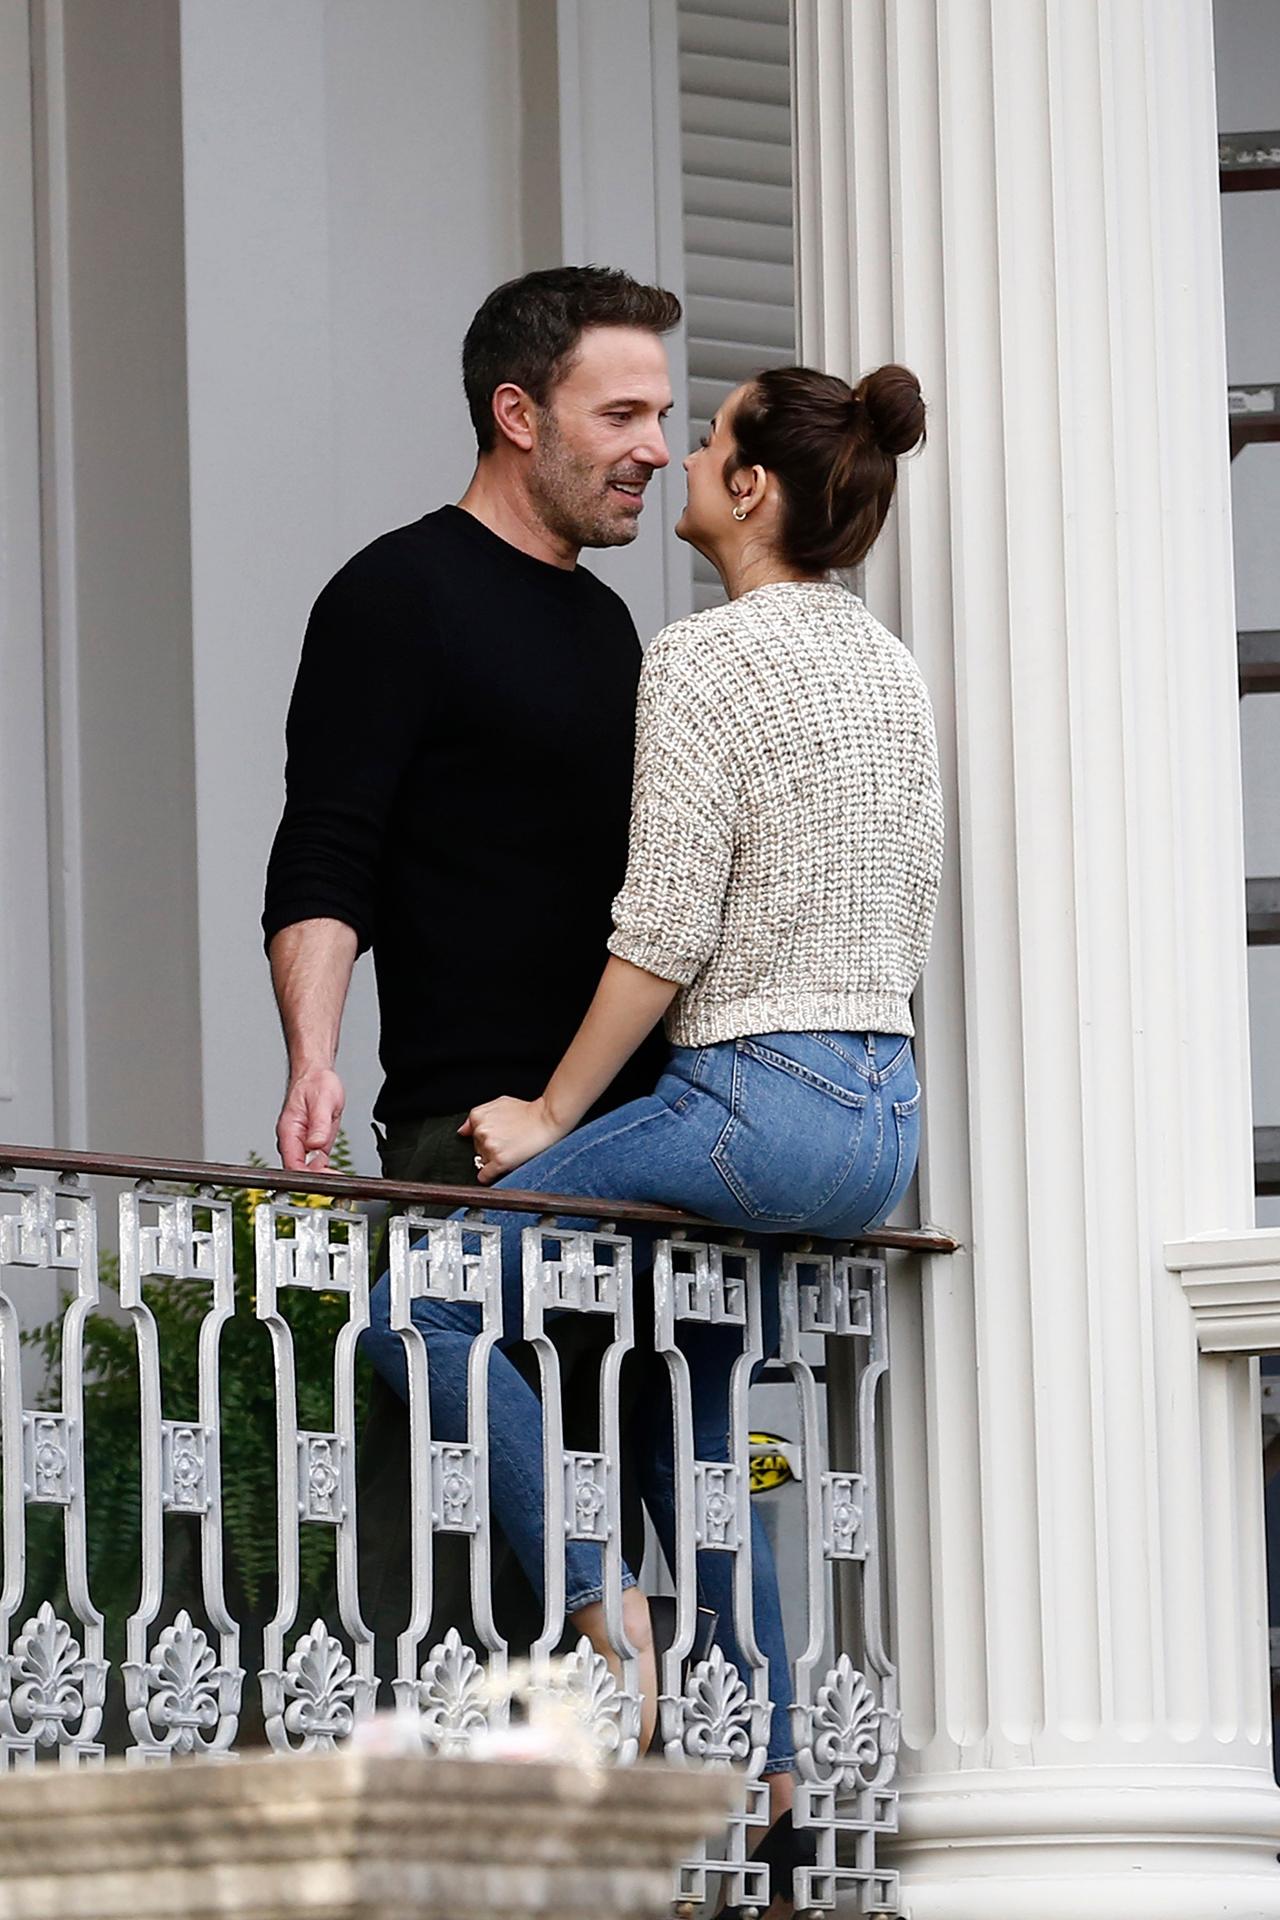 Ben Affleck and Ana de Armas kissing on a balcony